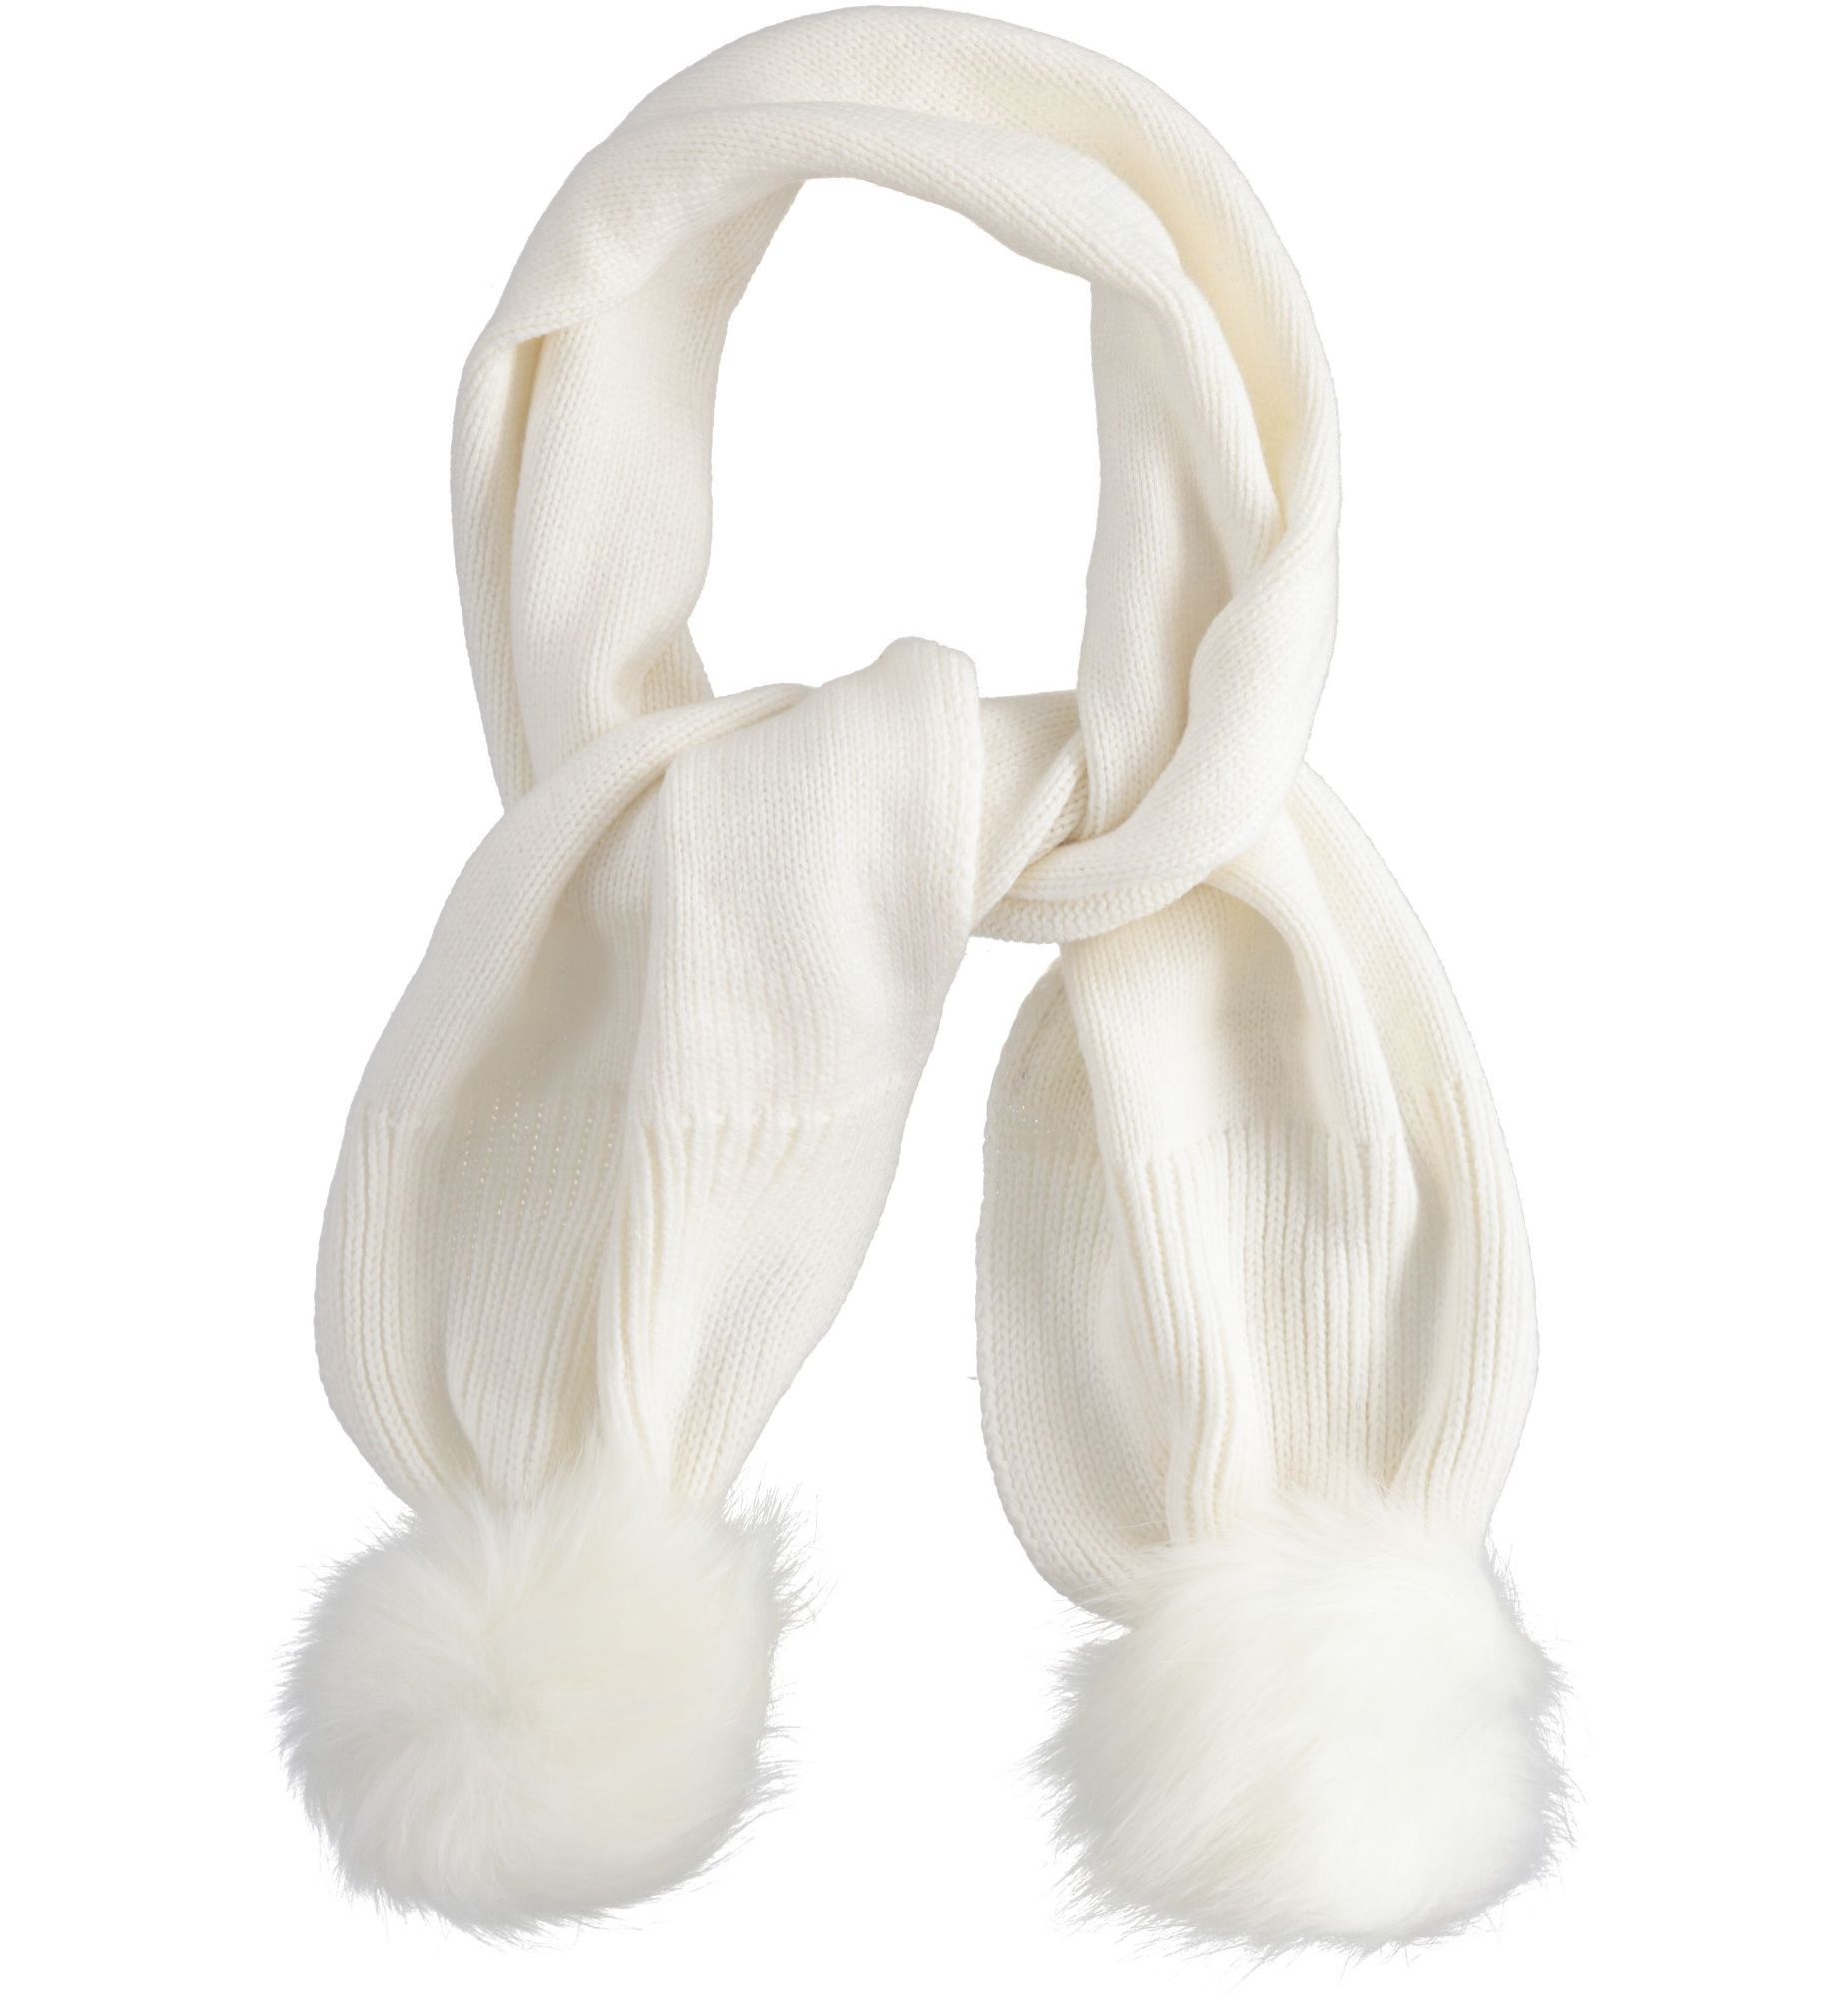 Ido IDO Girls Knitted Scarf - 43050 AW21